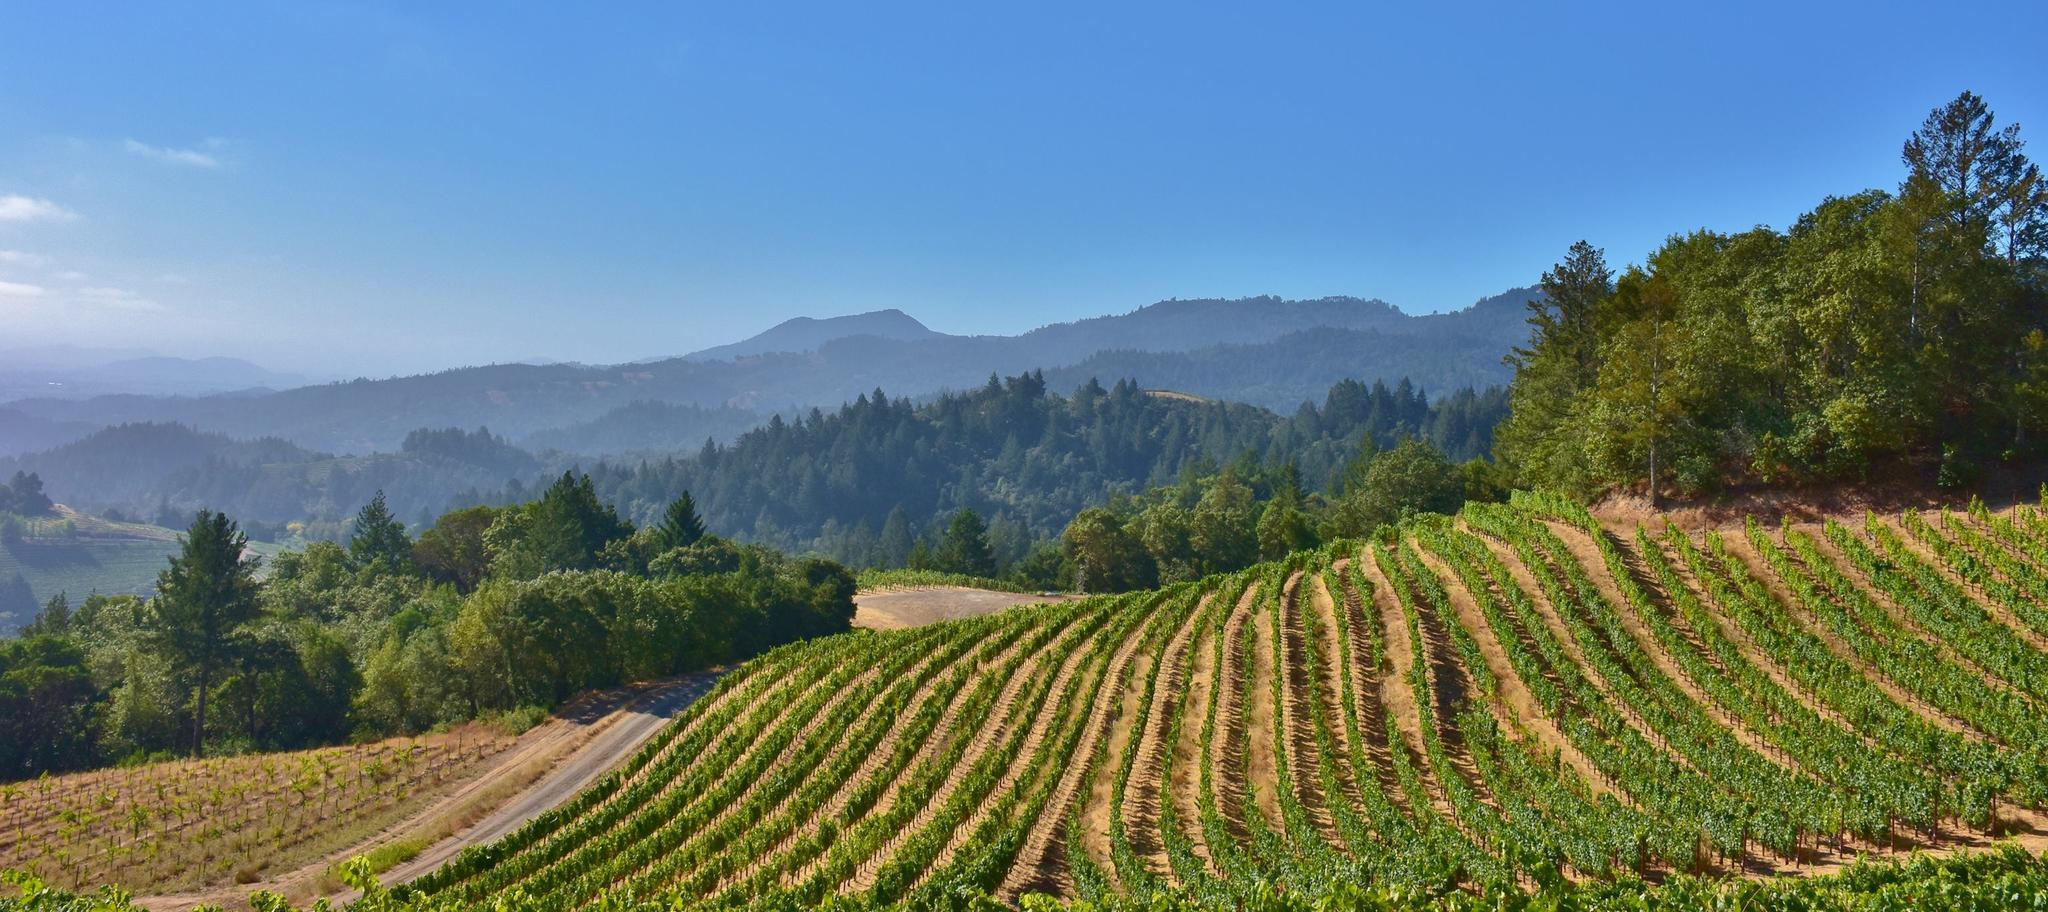 Spring Mountain Vineyard Cover Image